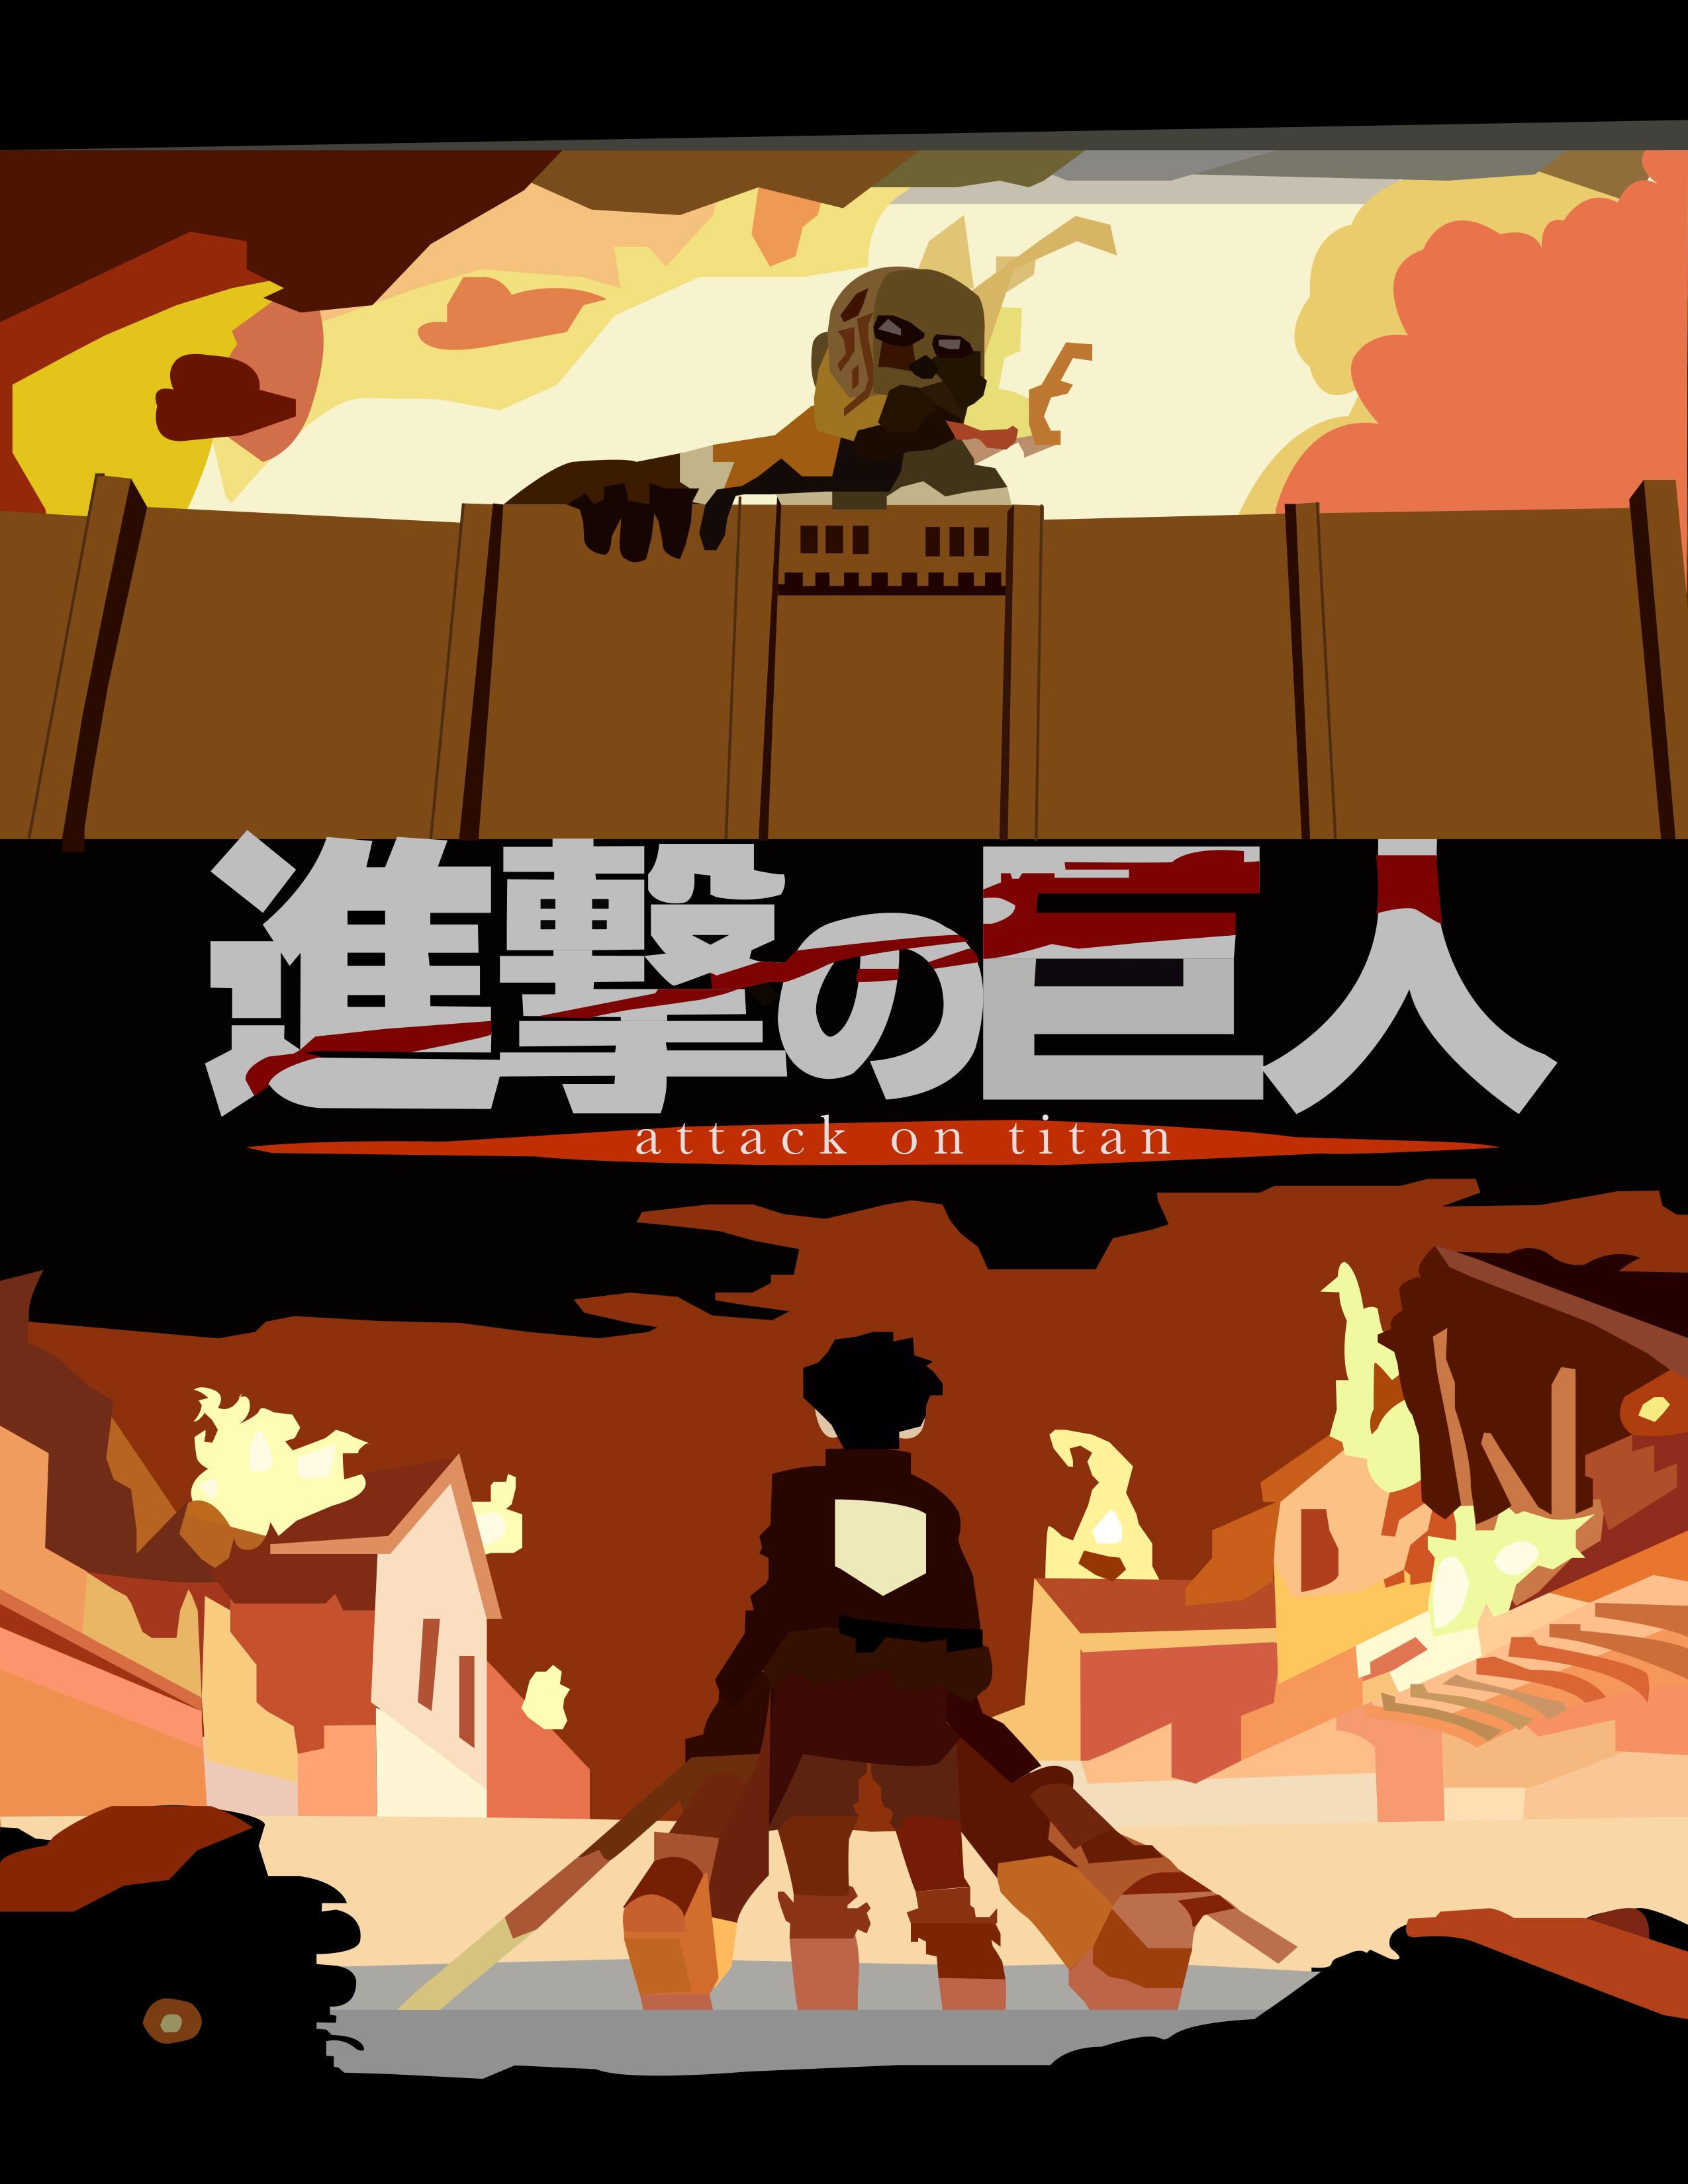 Attack on Titan - Adobe Illustrator